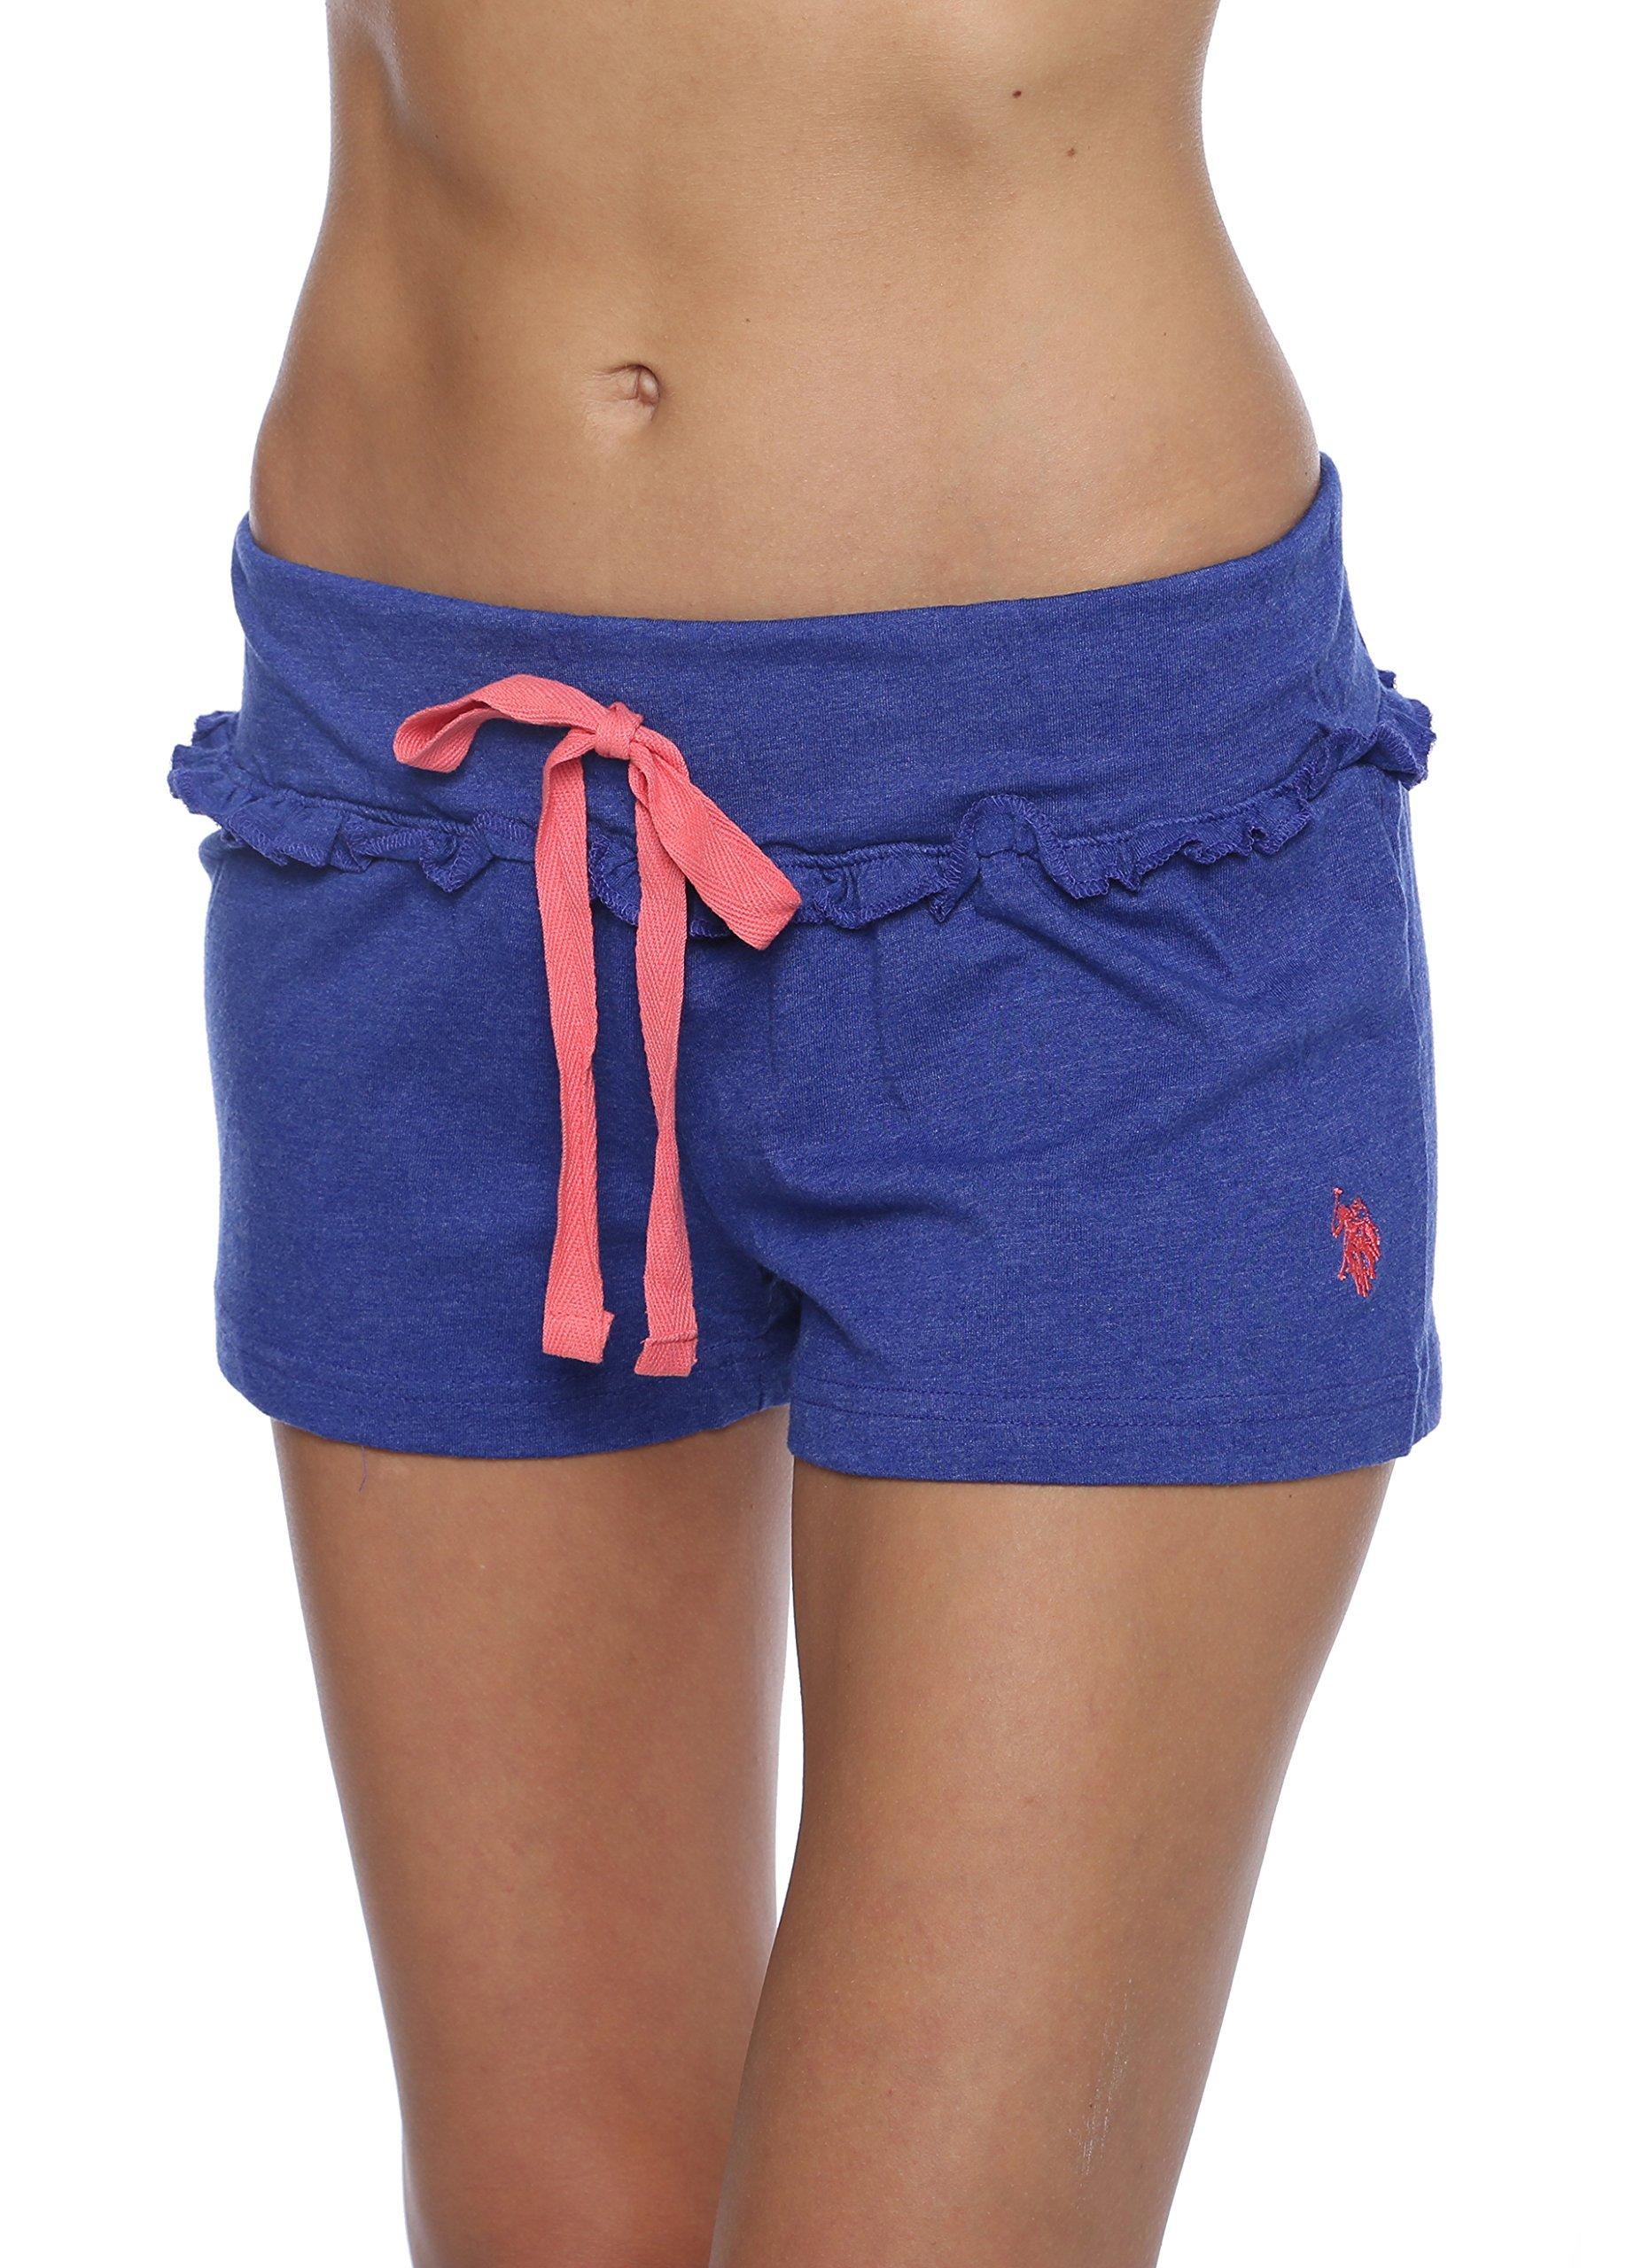 US Polo Assn. Womens Sleep/Lounge Ruffle Trims Shorts with Elastic Waistband Clematis Blue Medium